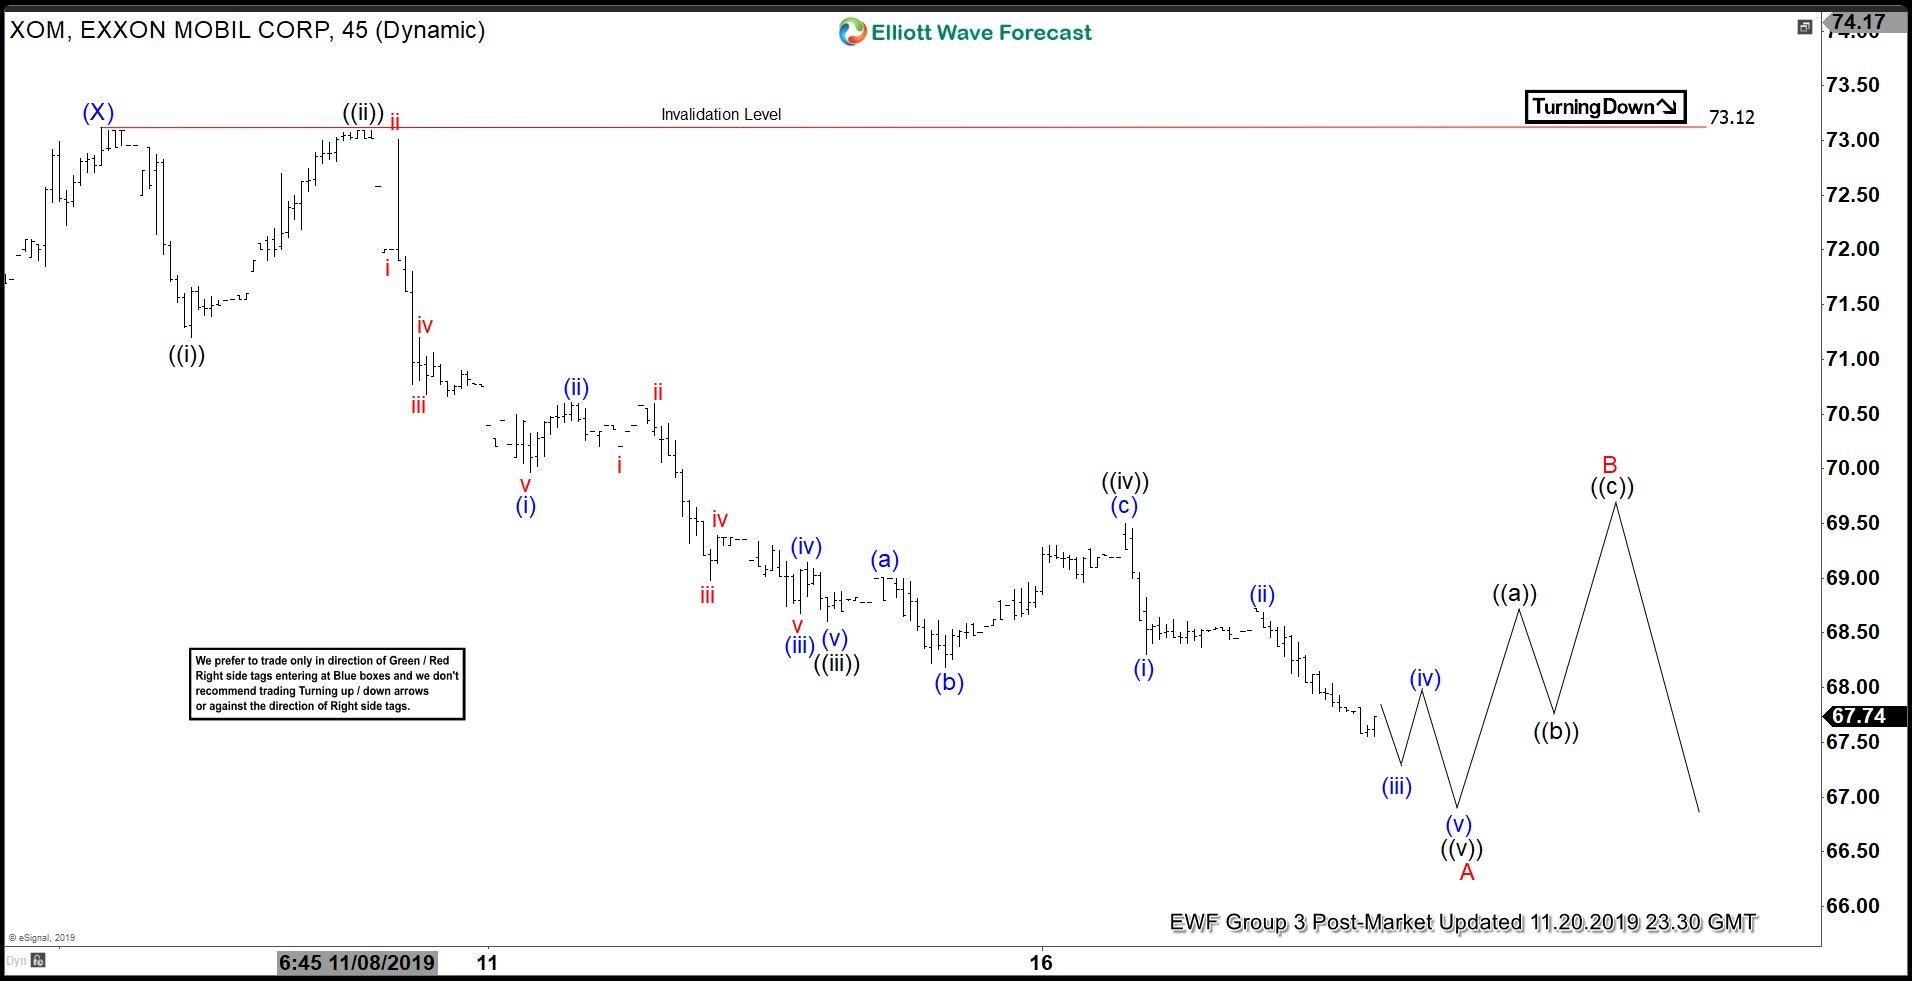 Elliott Wave View: Further Downside in Exxon Mobil